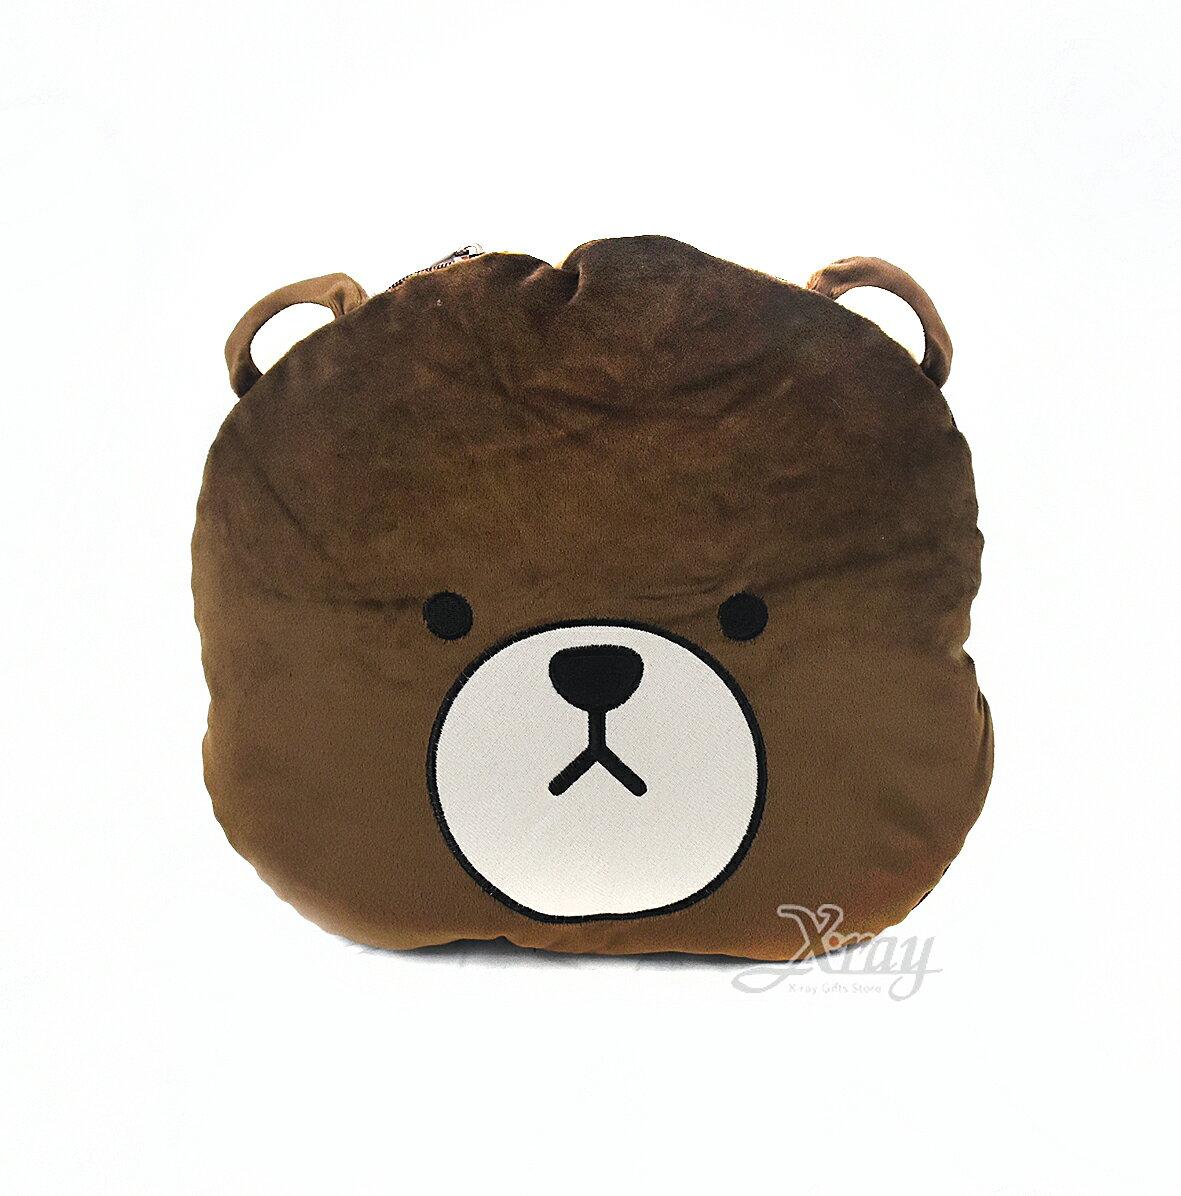 X射線【C020038】LINE熊大-棉被抱枕,可當棉被又可收納成抱枕/枕頭/抱枕/靠墊/午睡枕